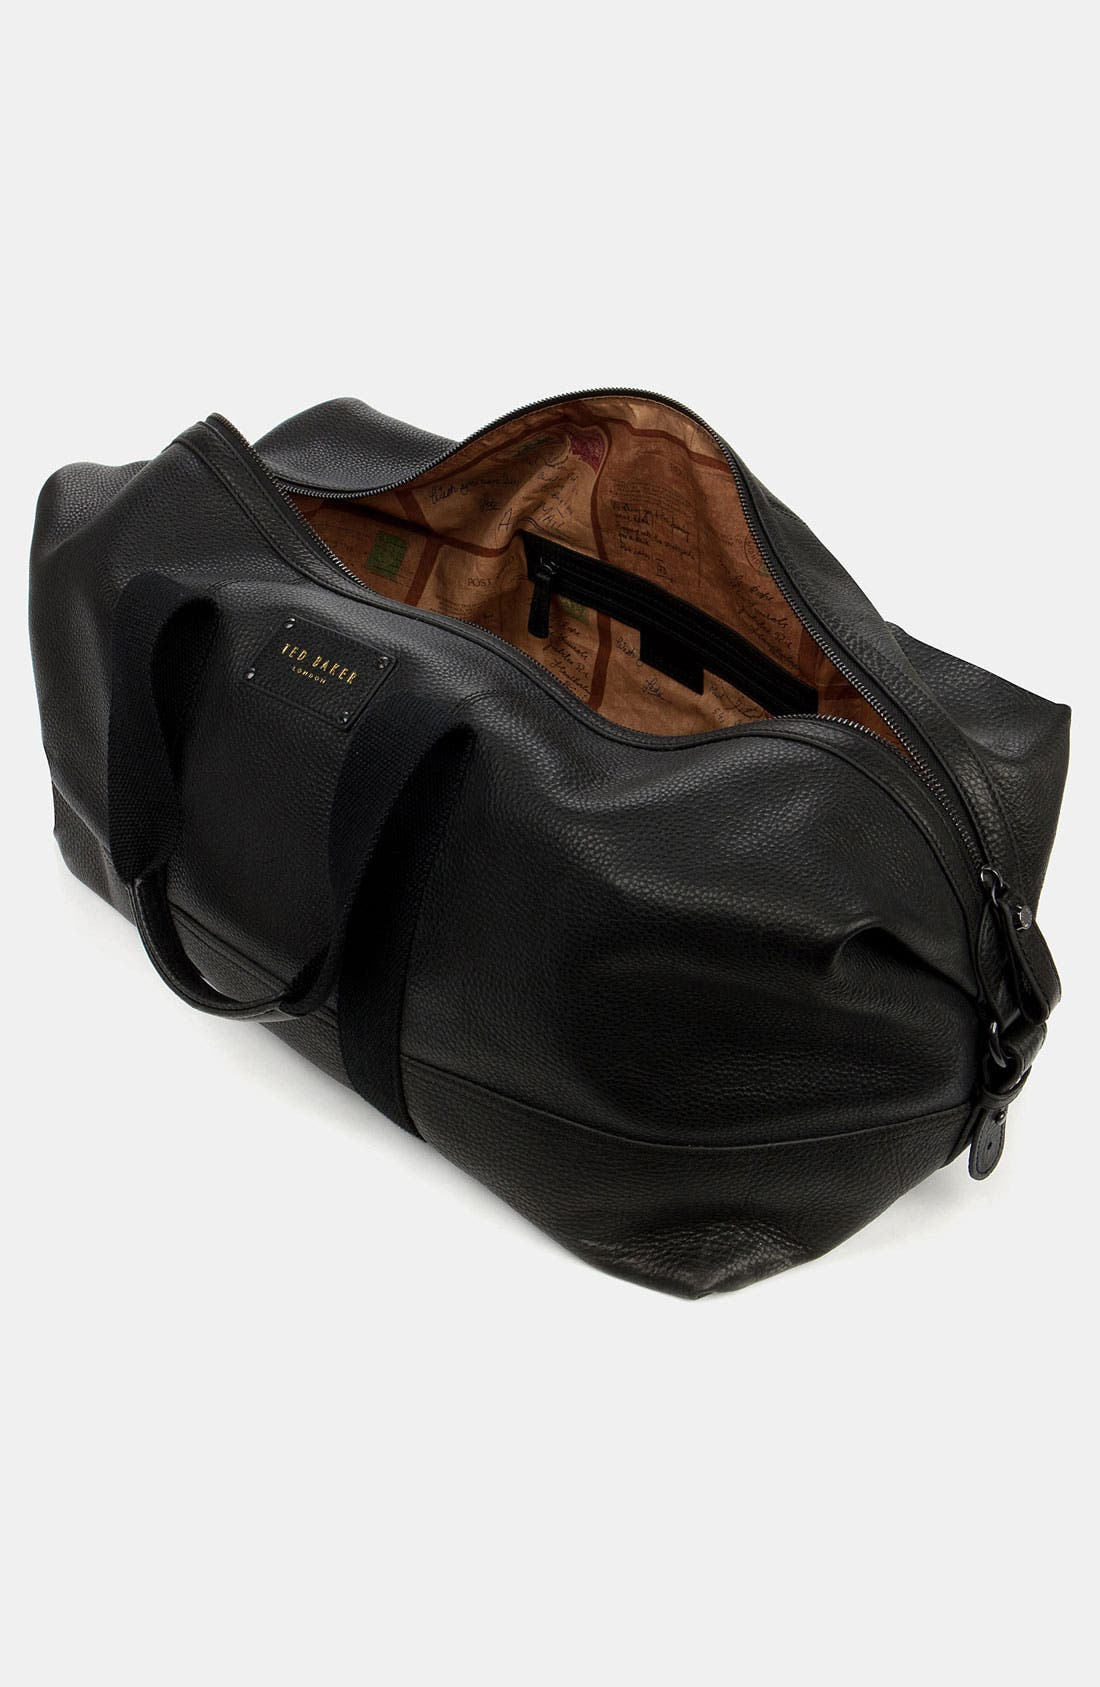 Leather Duffel Bag,                             Alternate thumbnail 3, color,